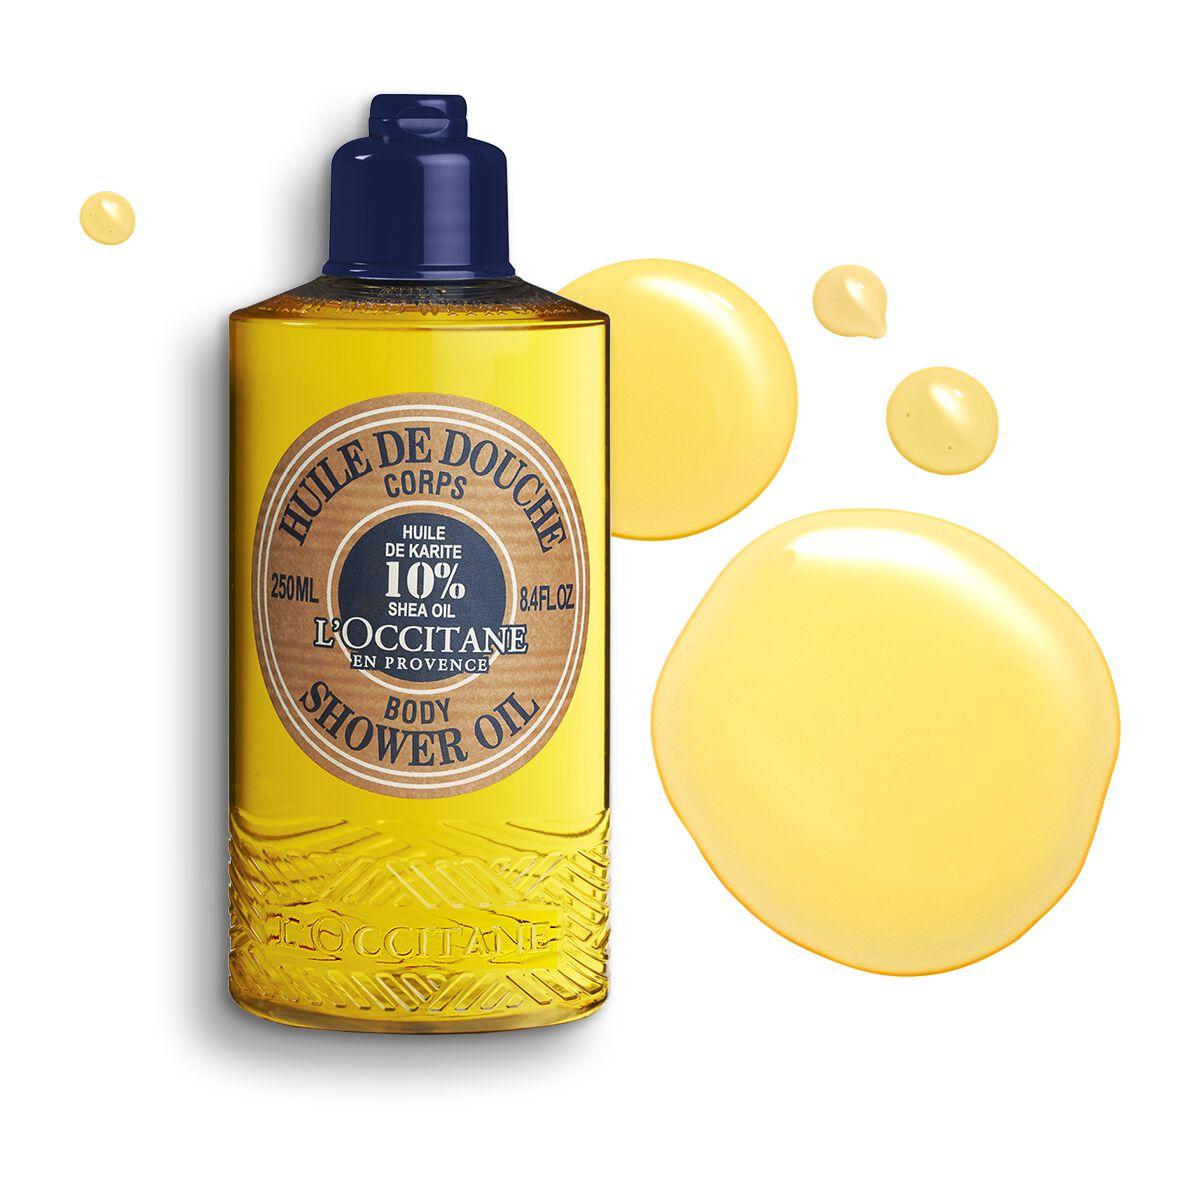 Shea Body Shower Oil 8.4 fl. oz.